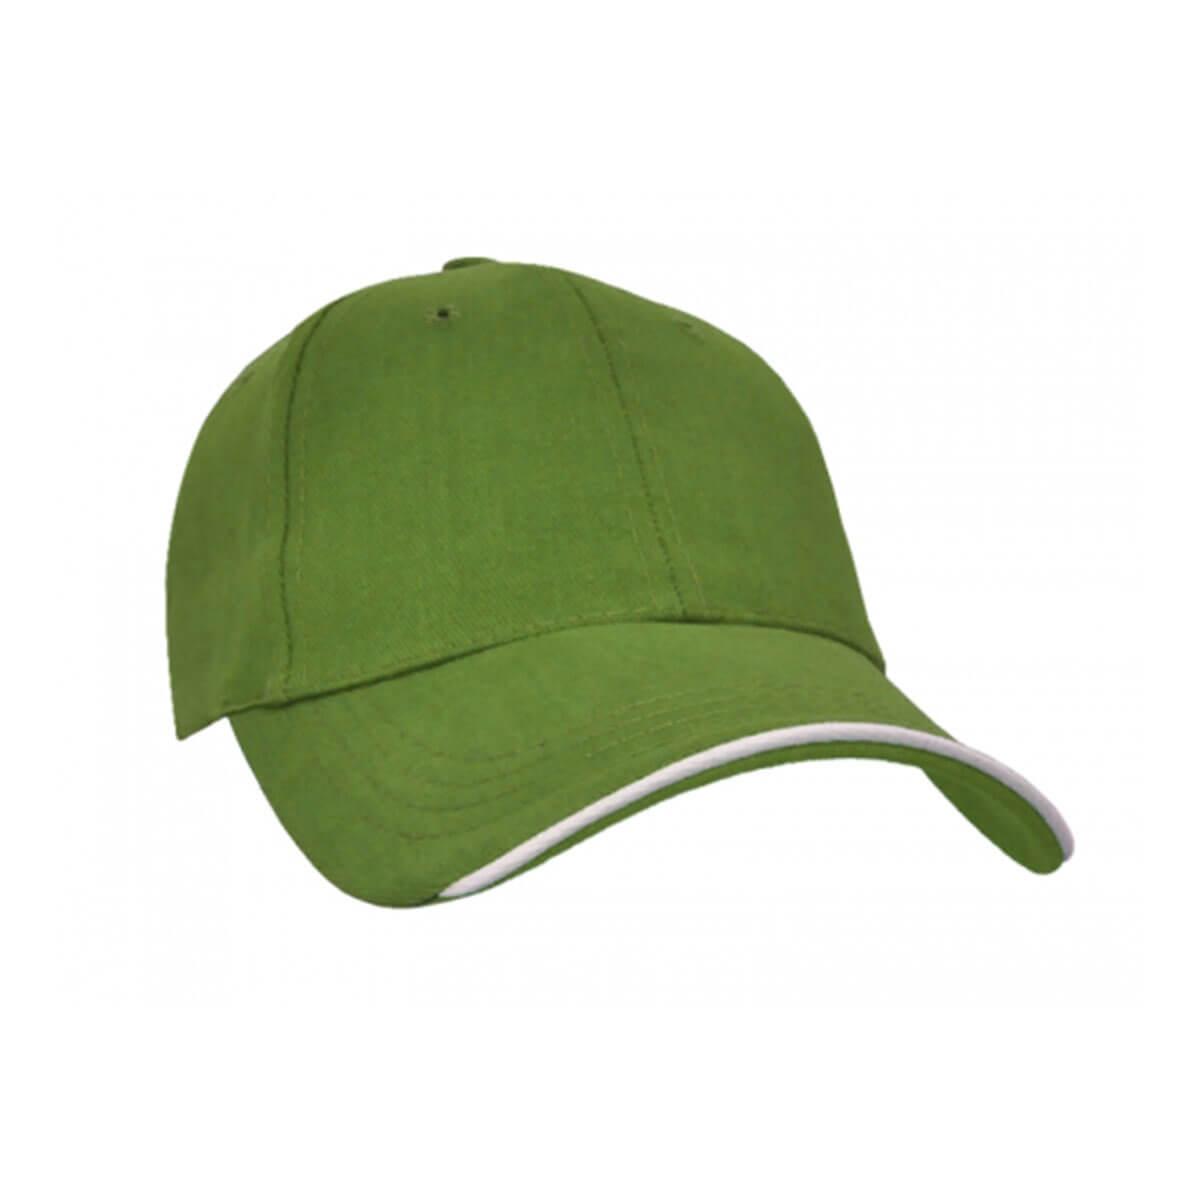 Navigator Cap-Olive / White / Olive